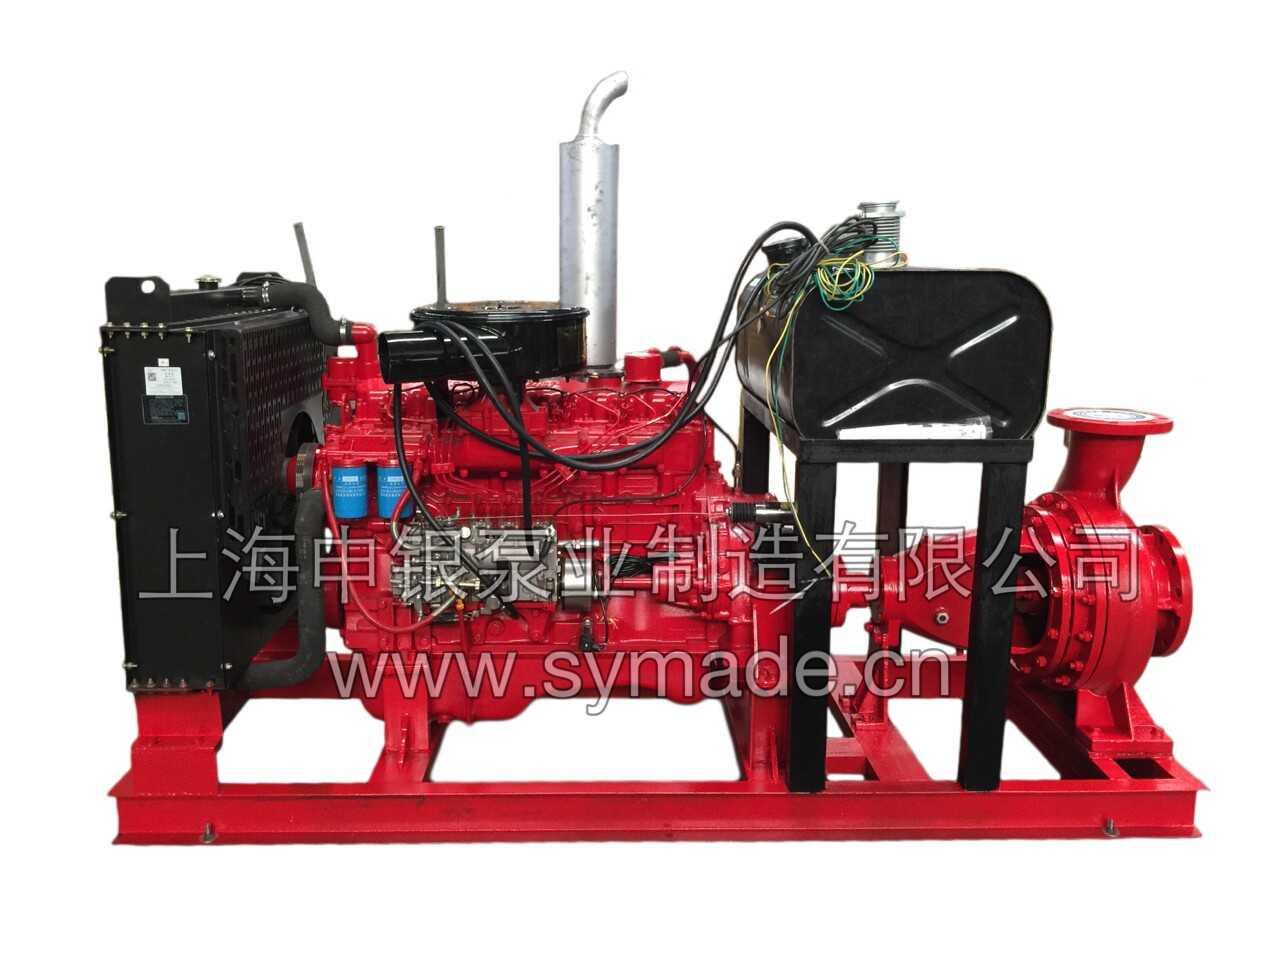 XBC型柴油机消防泵是上海申银泵业制造有限公司根据国内及国际消防用泵的市场需求和使用情况而自主研发生产的消防产品。该系列产品的使用效率高、运转寿命长、产品可靠性好,是目前国内及国际市场上消防工程、喷淋设施的首选消防泵产品。国家消防装备质量监督检测中心根据GB6245-2006《消防泵》的性能要求和实验方法测试,上海申银泵业制造有限公司产品达到国内领先水平,获消防局审批认可。 该系列柴油机消防泵产品输送介质为温度80以下清水或物理化学性质类似与水的液体。除供给消防工程使用的前提下,还可供生活、生产给水的